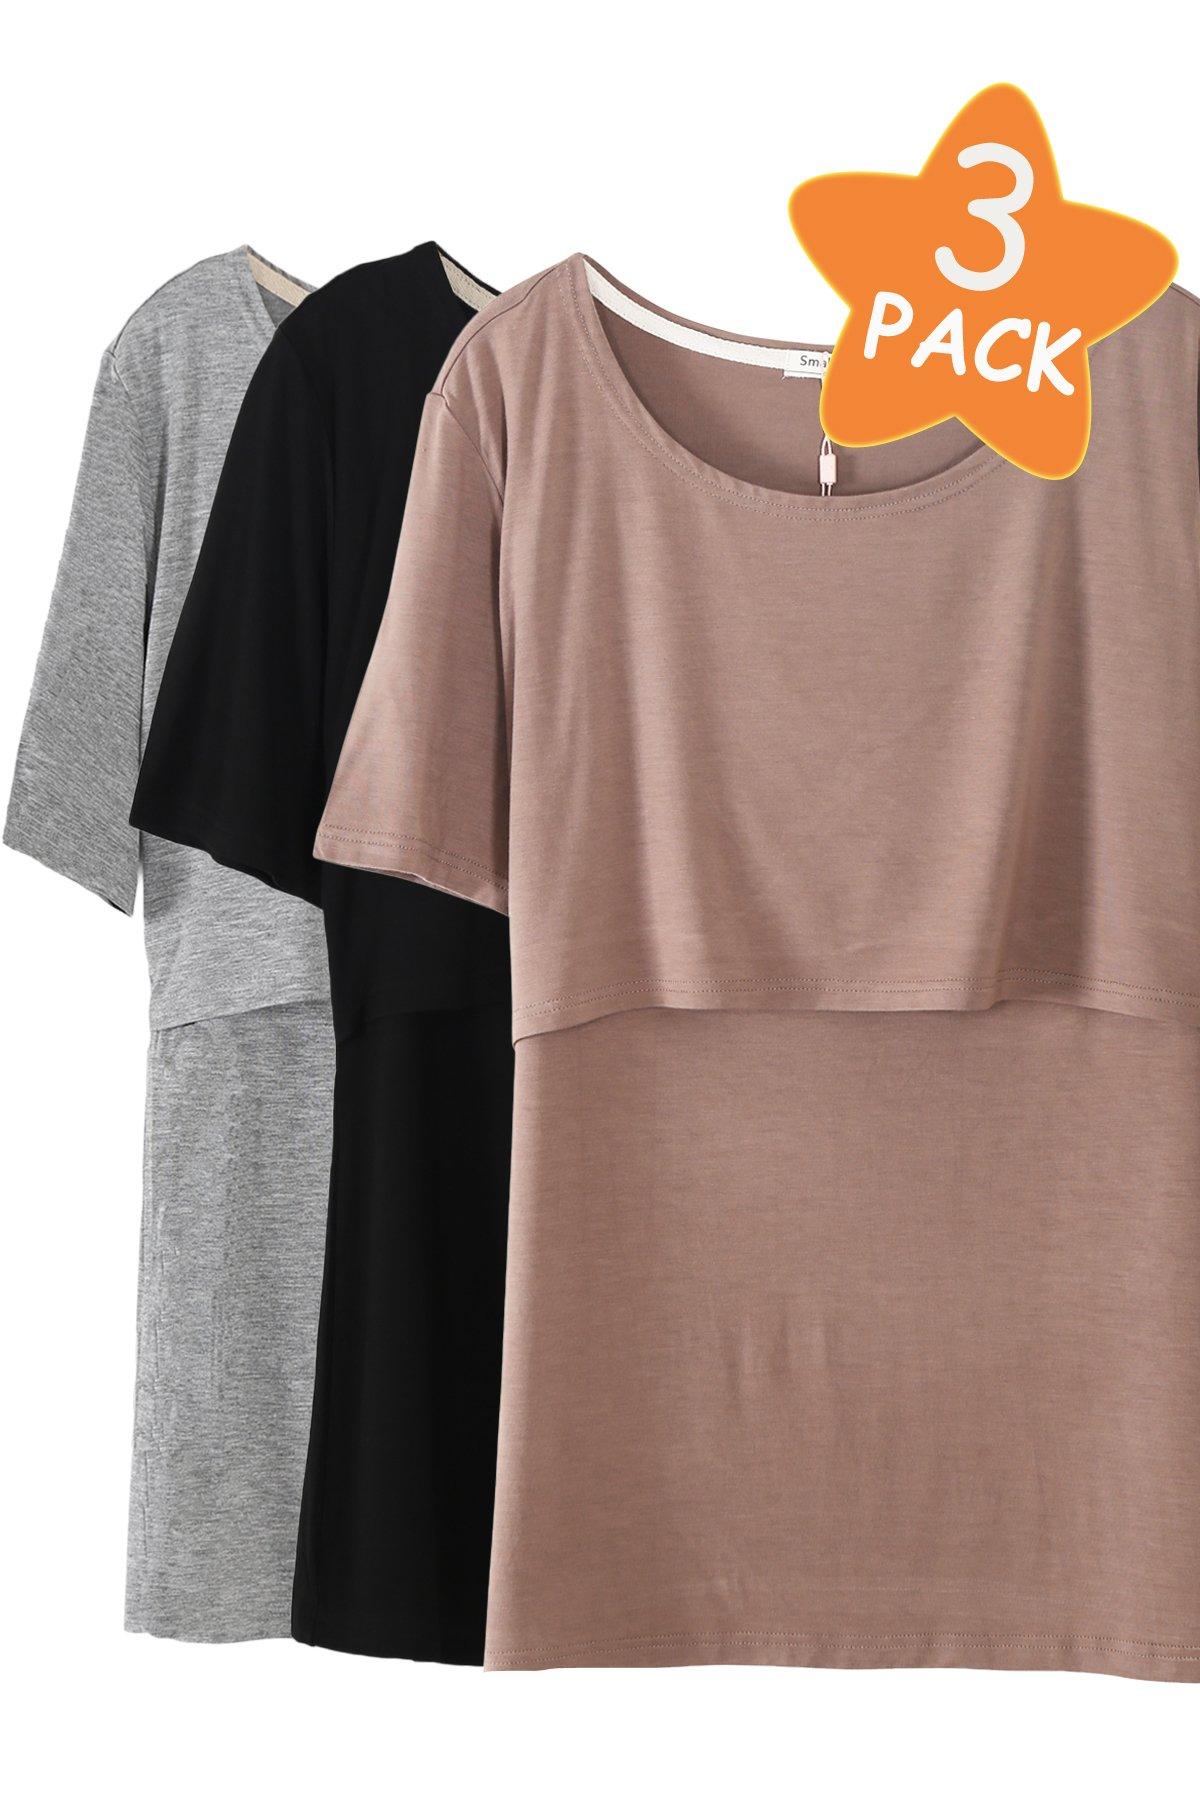 Smallshow 3 Pcs Maternity Nursing T-Shirt Modal Short Sleeve Nursing Tops Brown-Black-Grey,Large